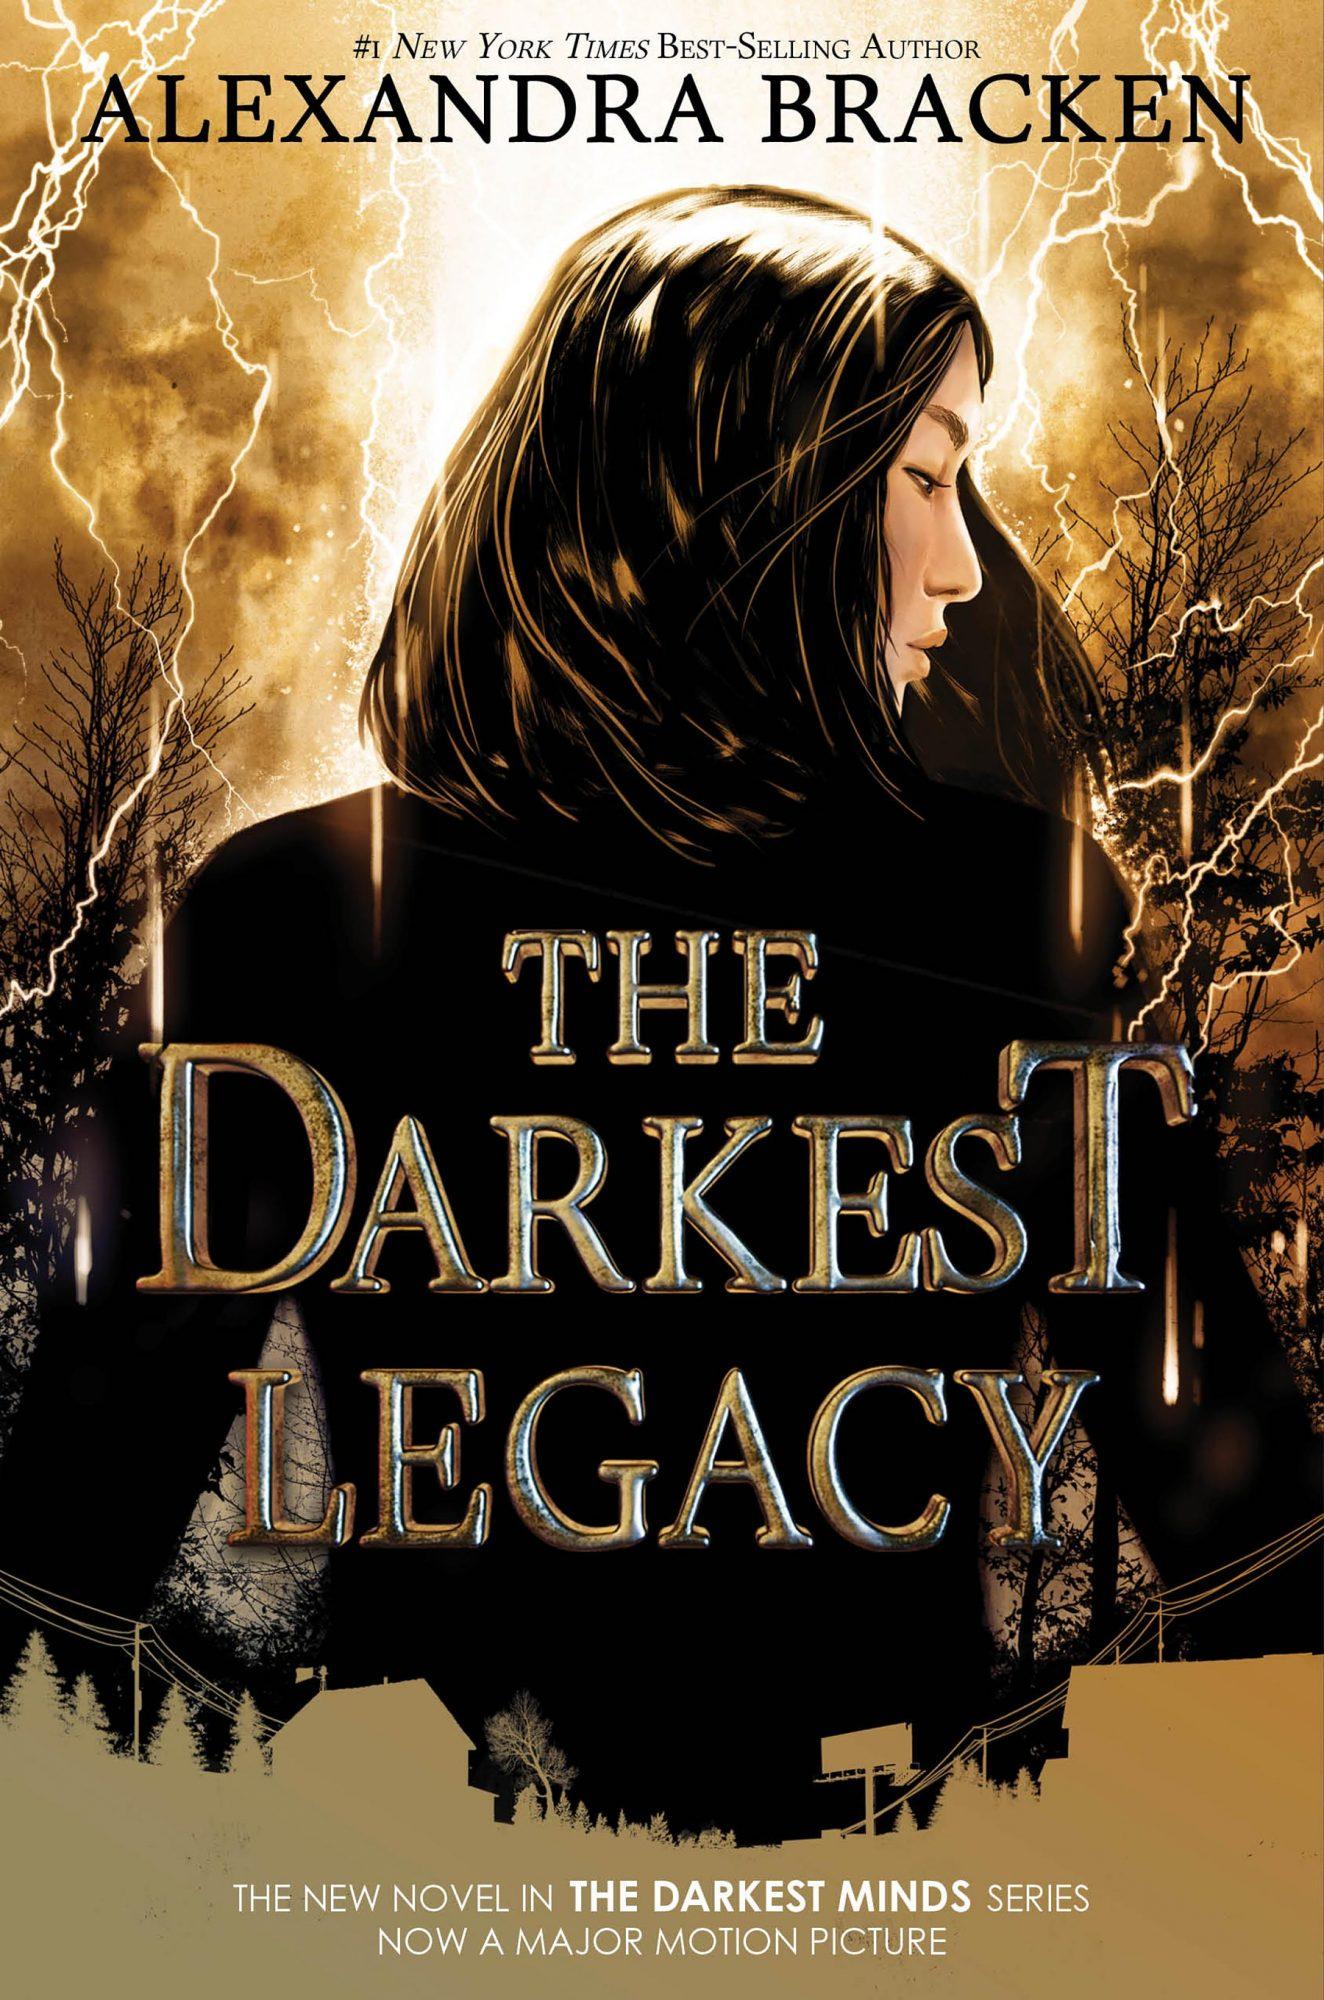 The Darkest Legacy by Alexandra Bracken CR: HarperCollins